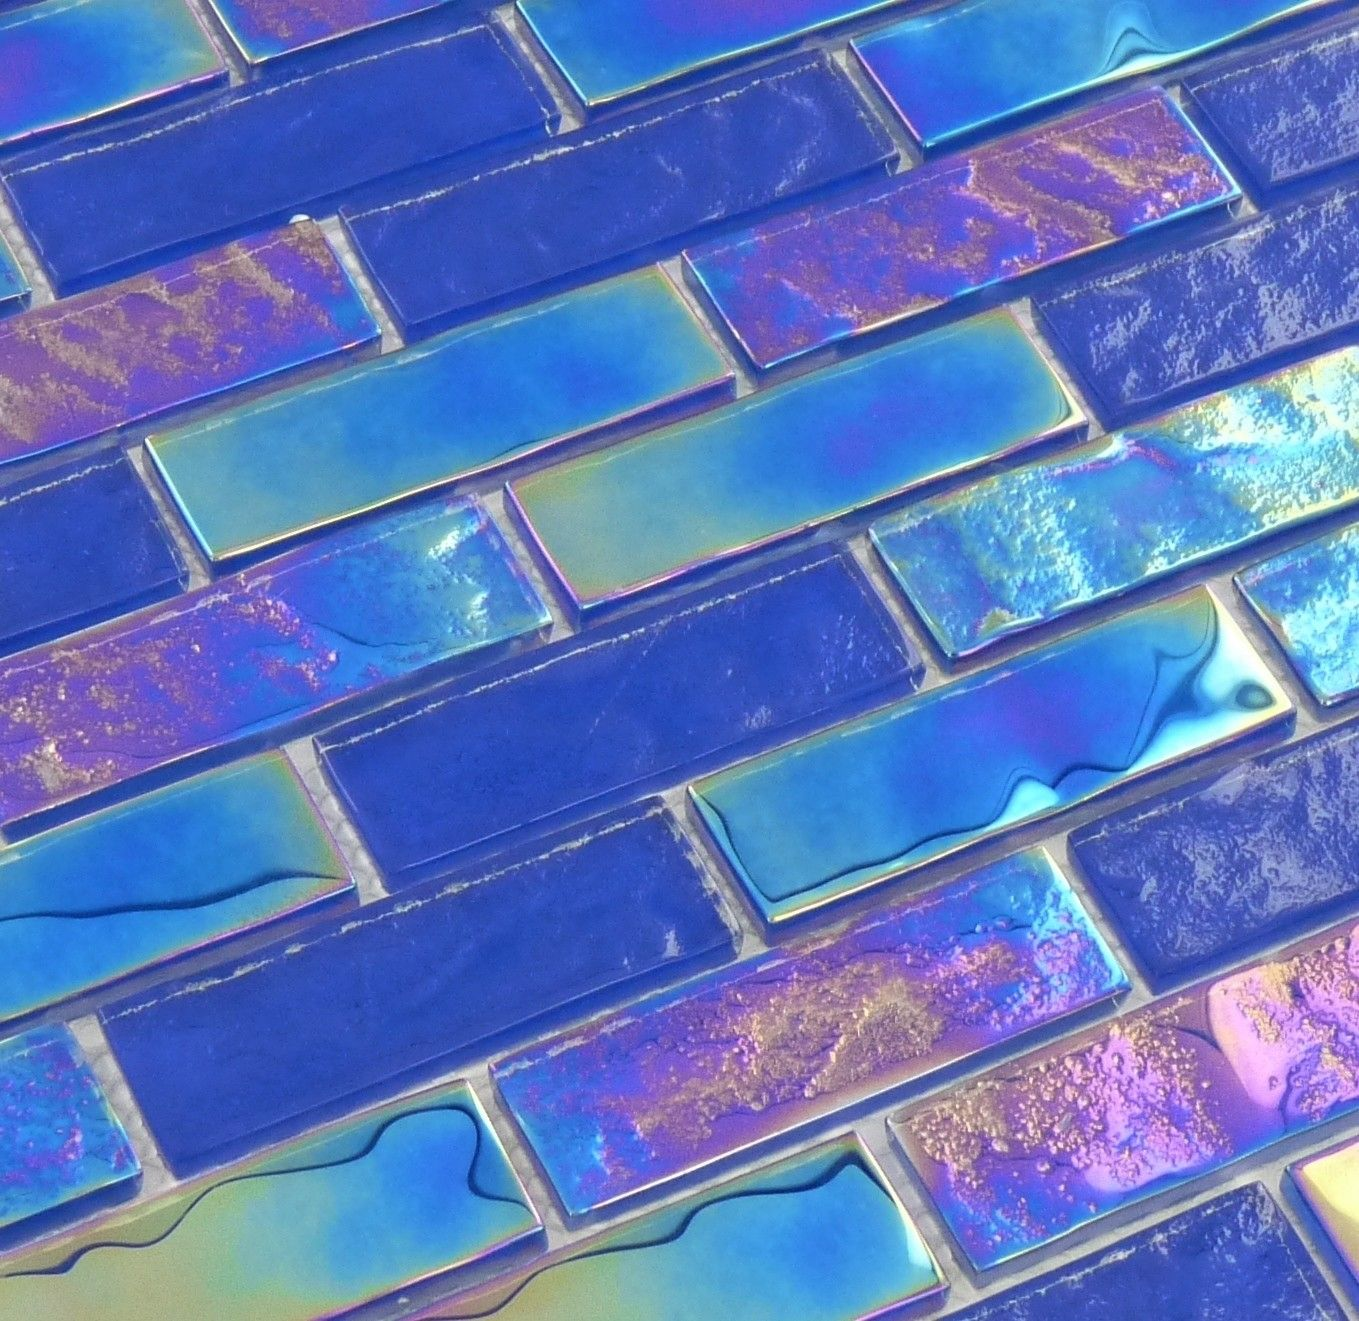 Tesoro Naval Blue 1 X 3 Glossy Iridescent Glass Tile Tasnautnaval13 Iridescent Glass Tiles Mermaid Tile Floor Colors